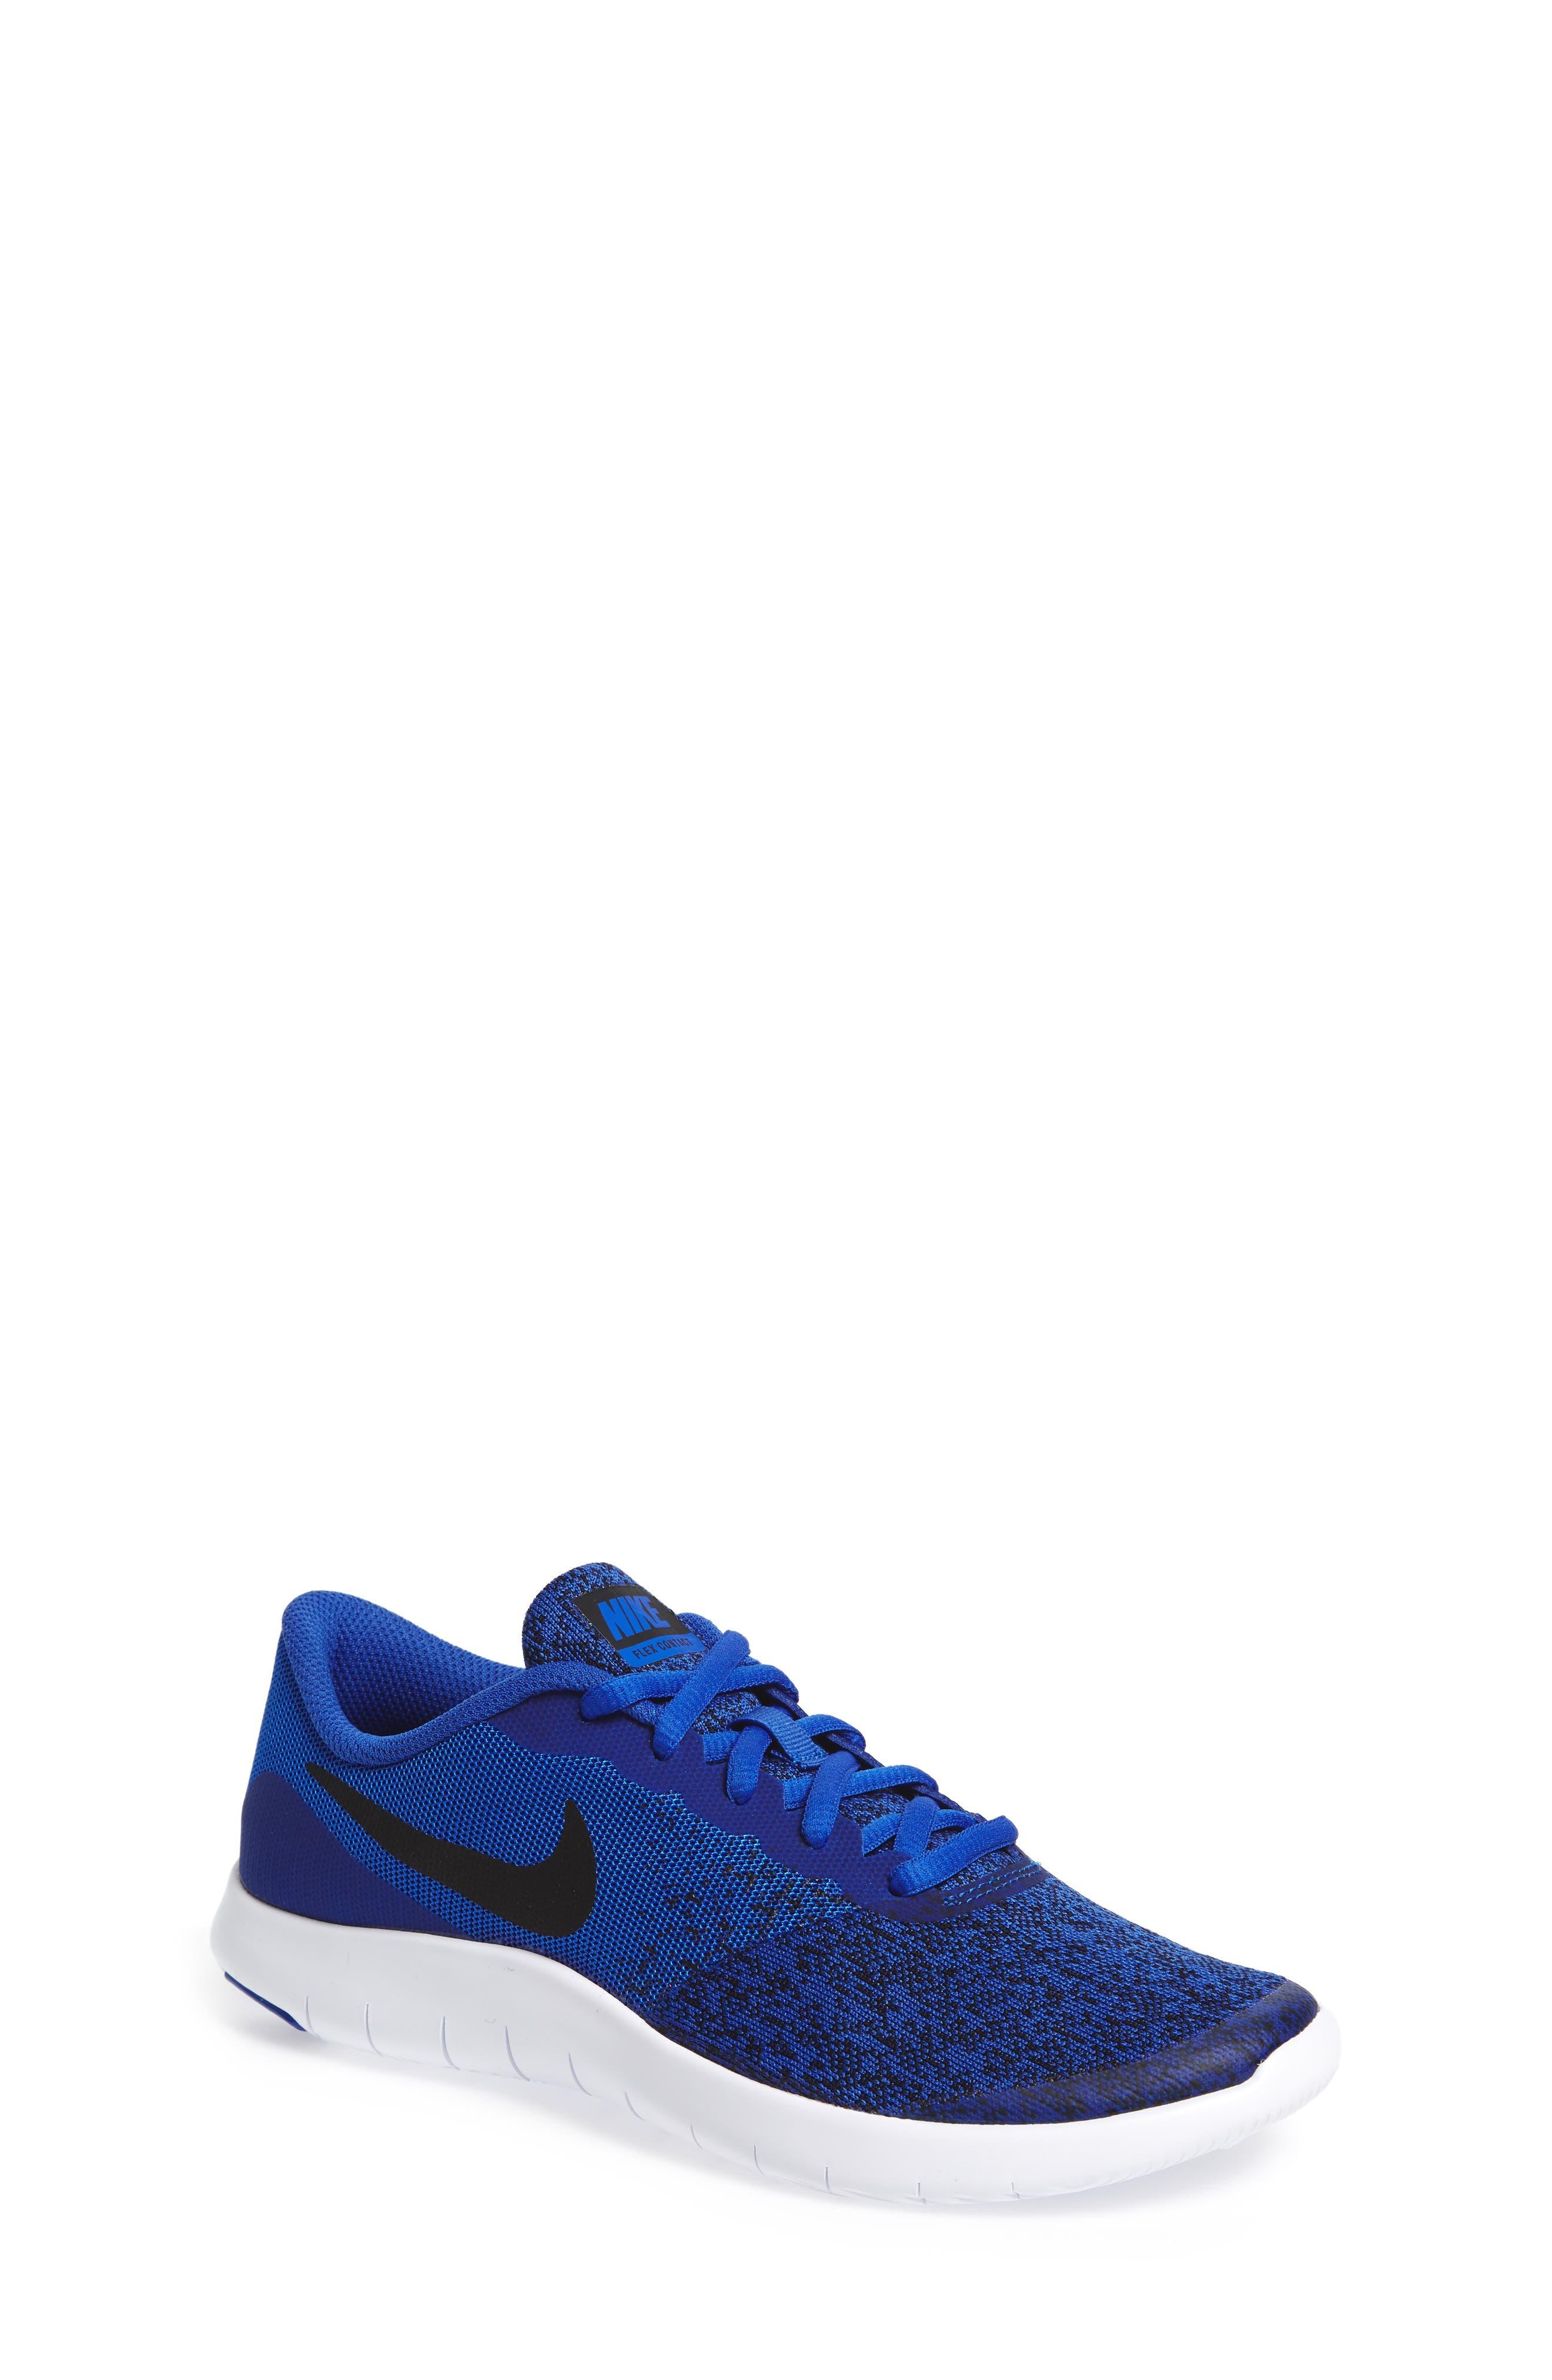 Flex Contact Running Shoe,                             Main thumbnail 4, color,